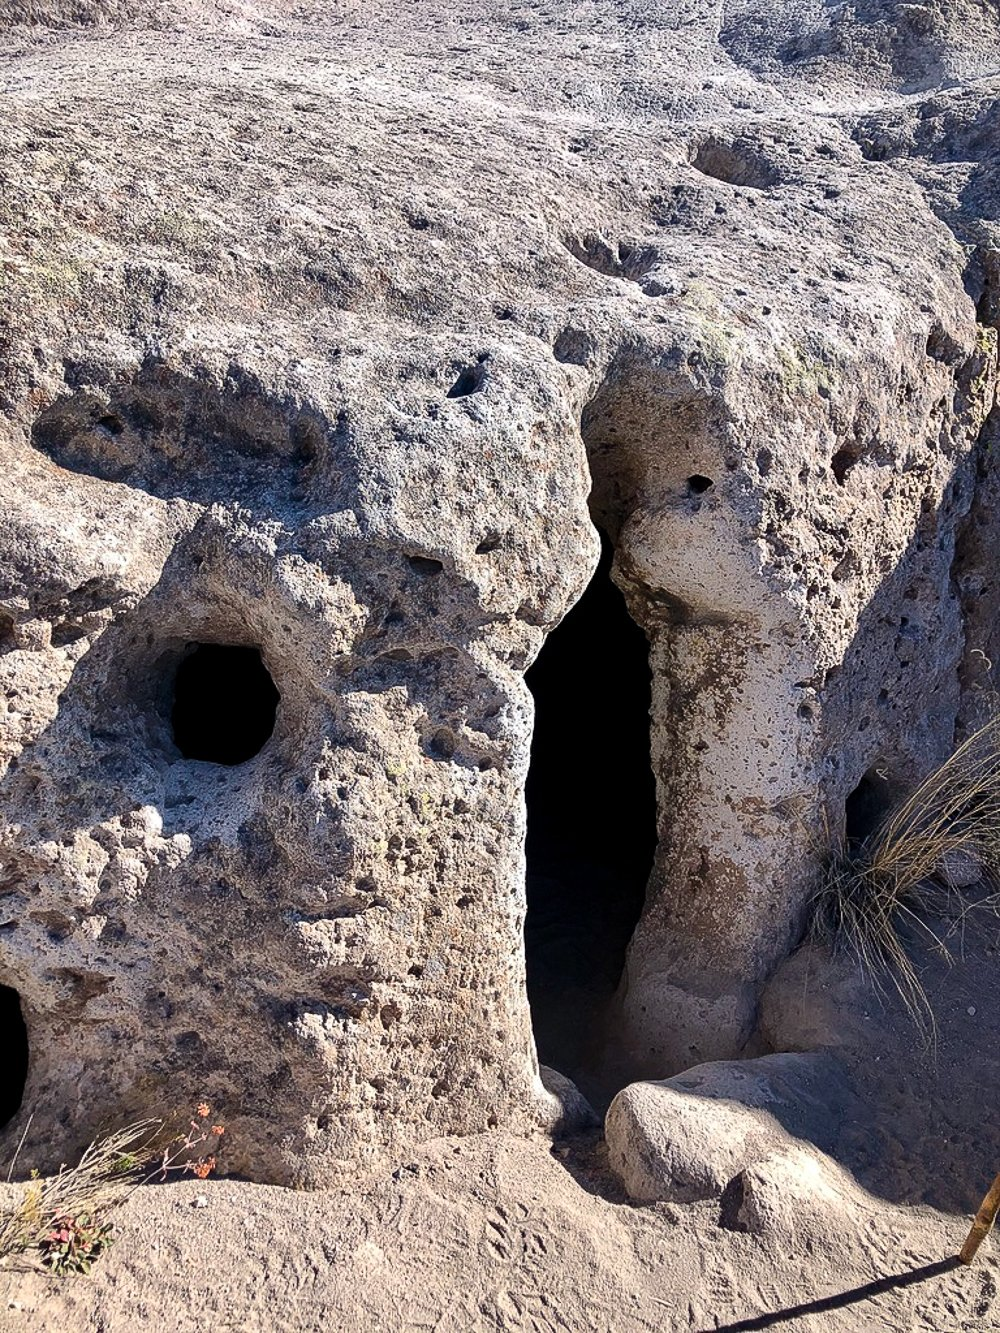 Ancient Native American dwelling at Bandelier Monument, Santa Fe